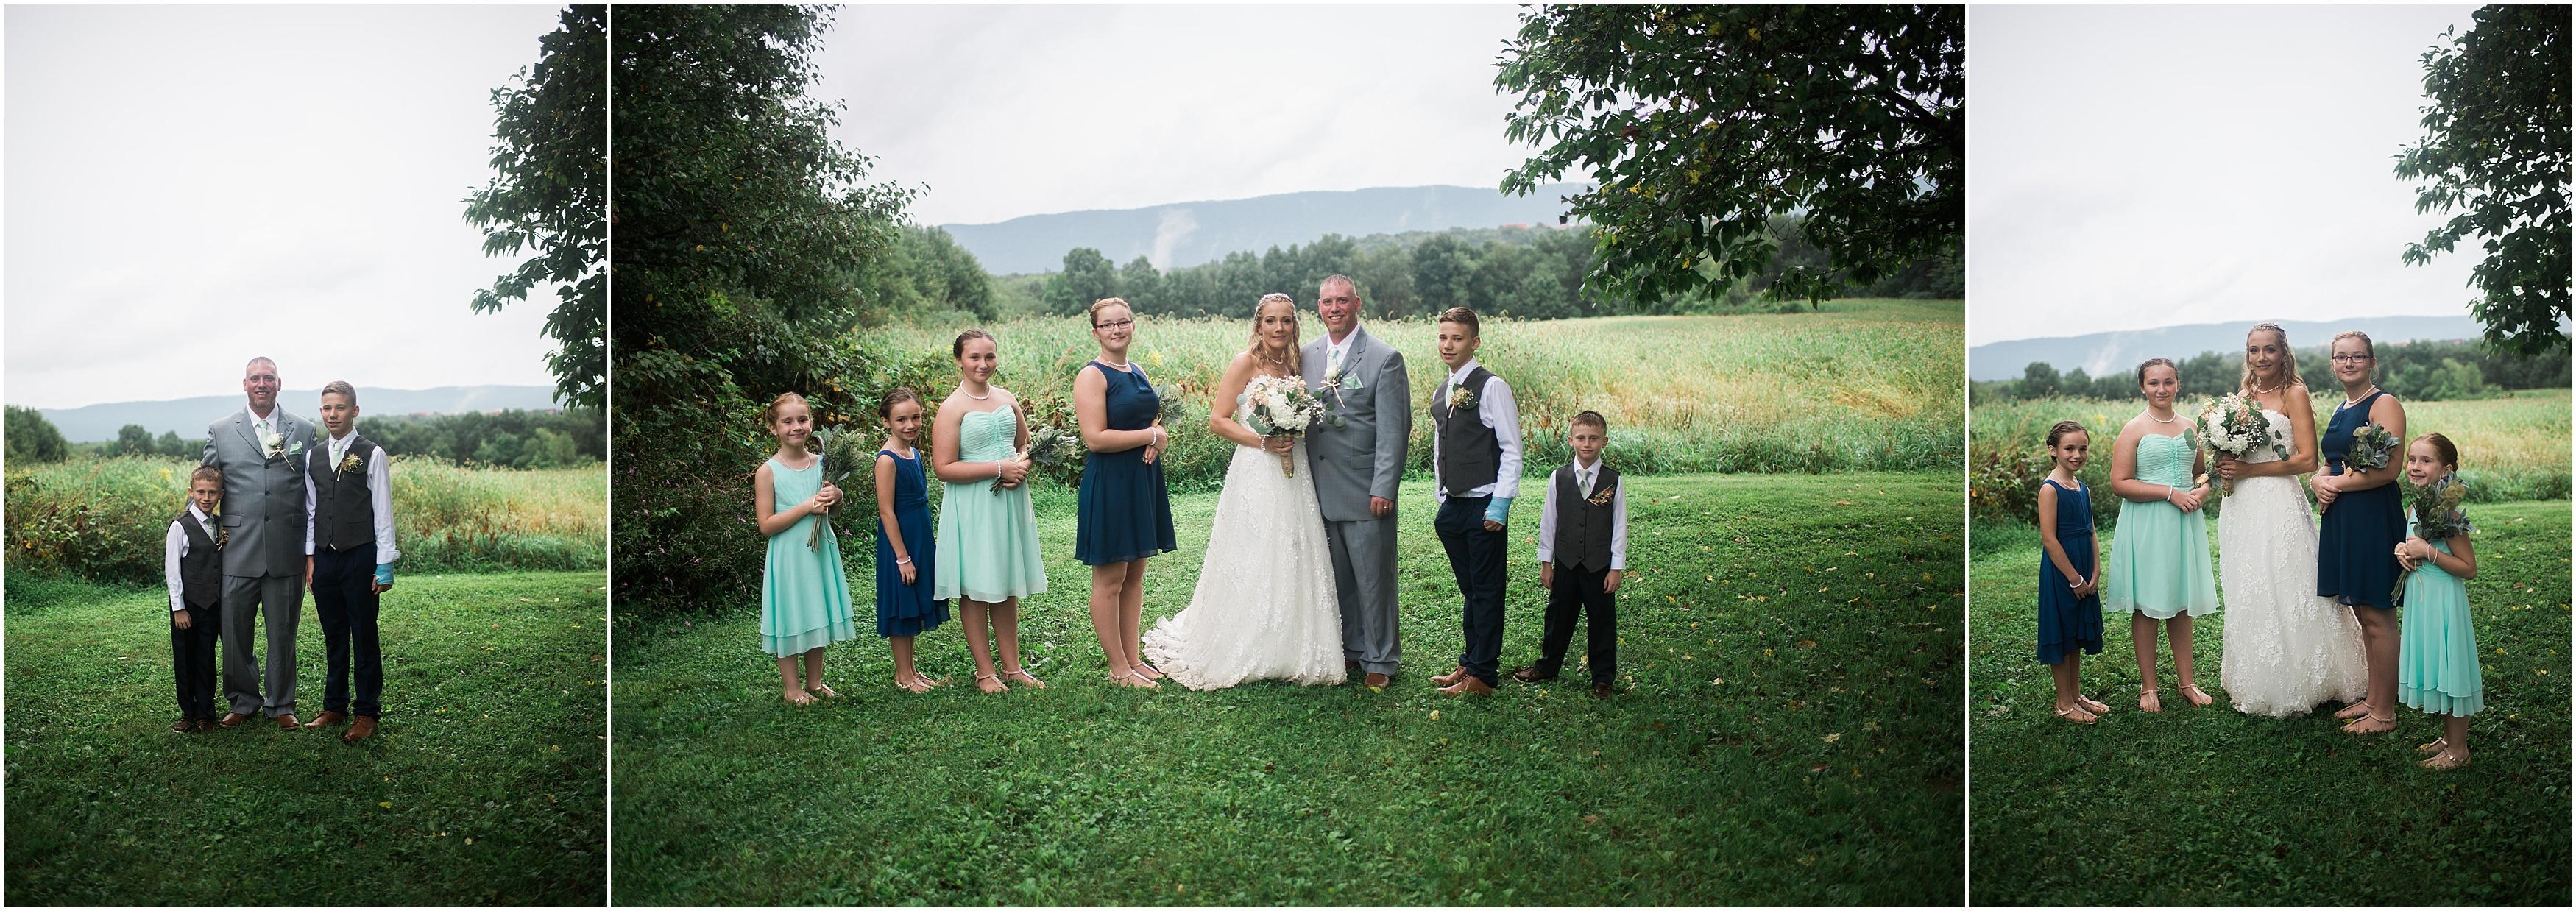 NEPA Wedding and Destination Photographer | Tasha Puckey Photography